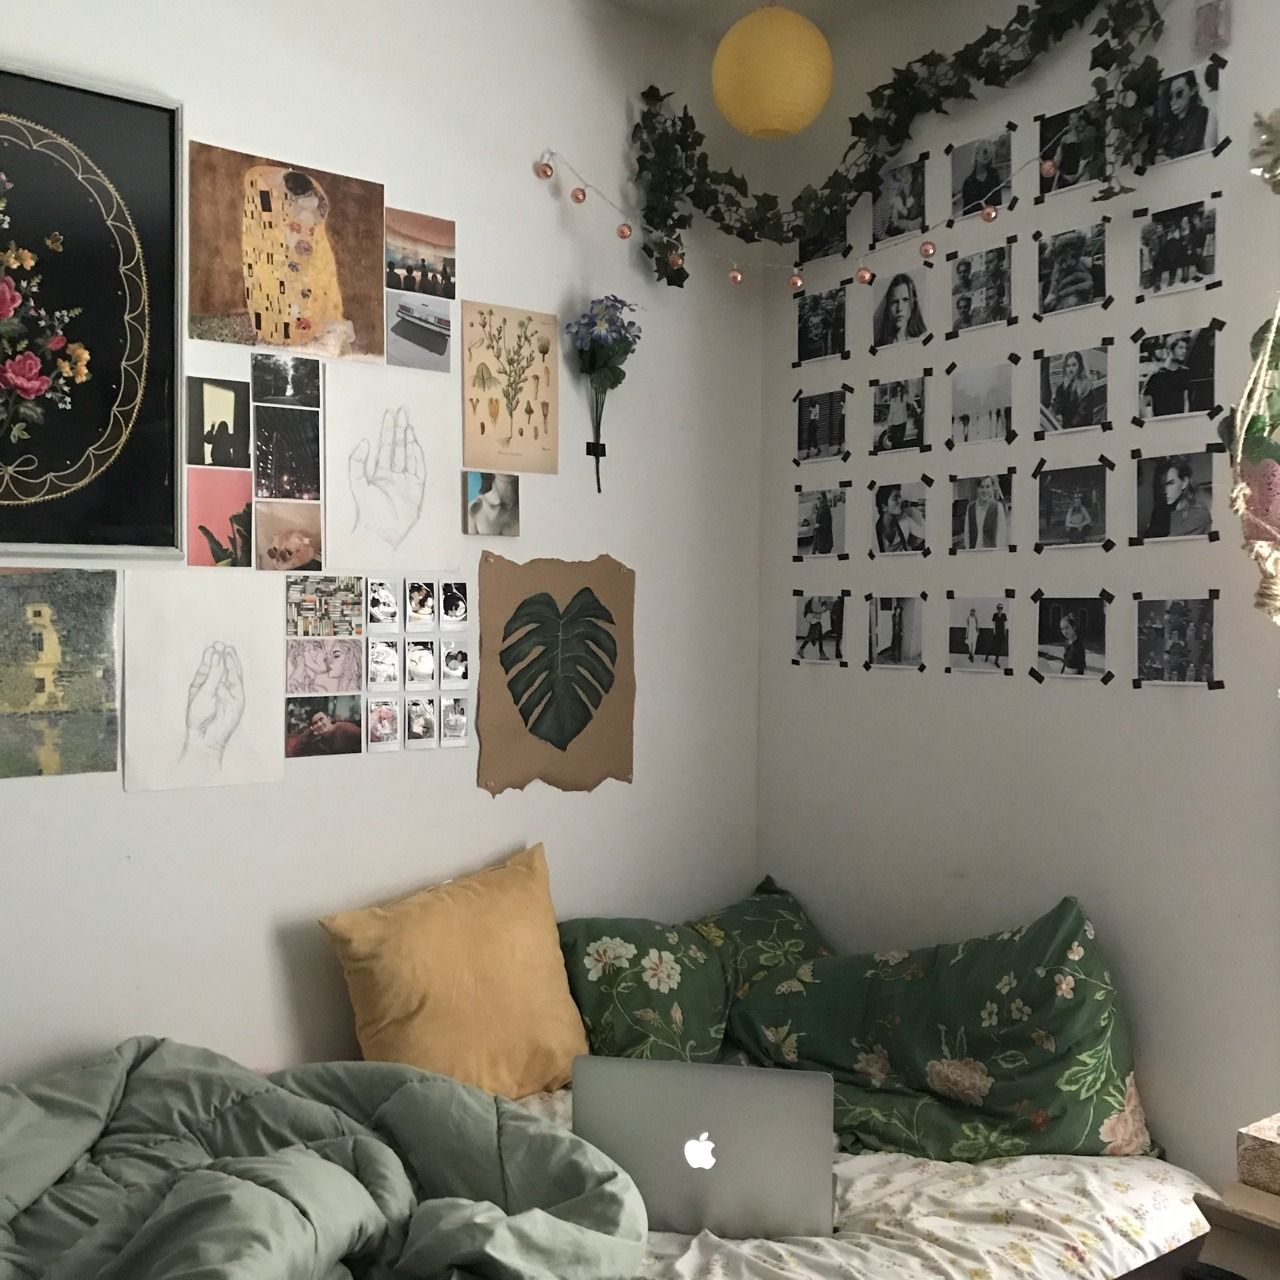 Green Bedroom Tumblr Creative Wall Painting Multipurpose Room Room Decor